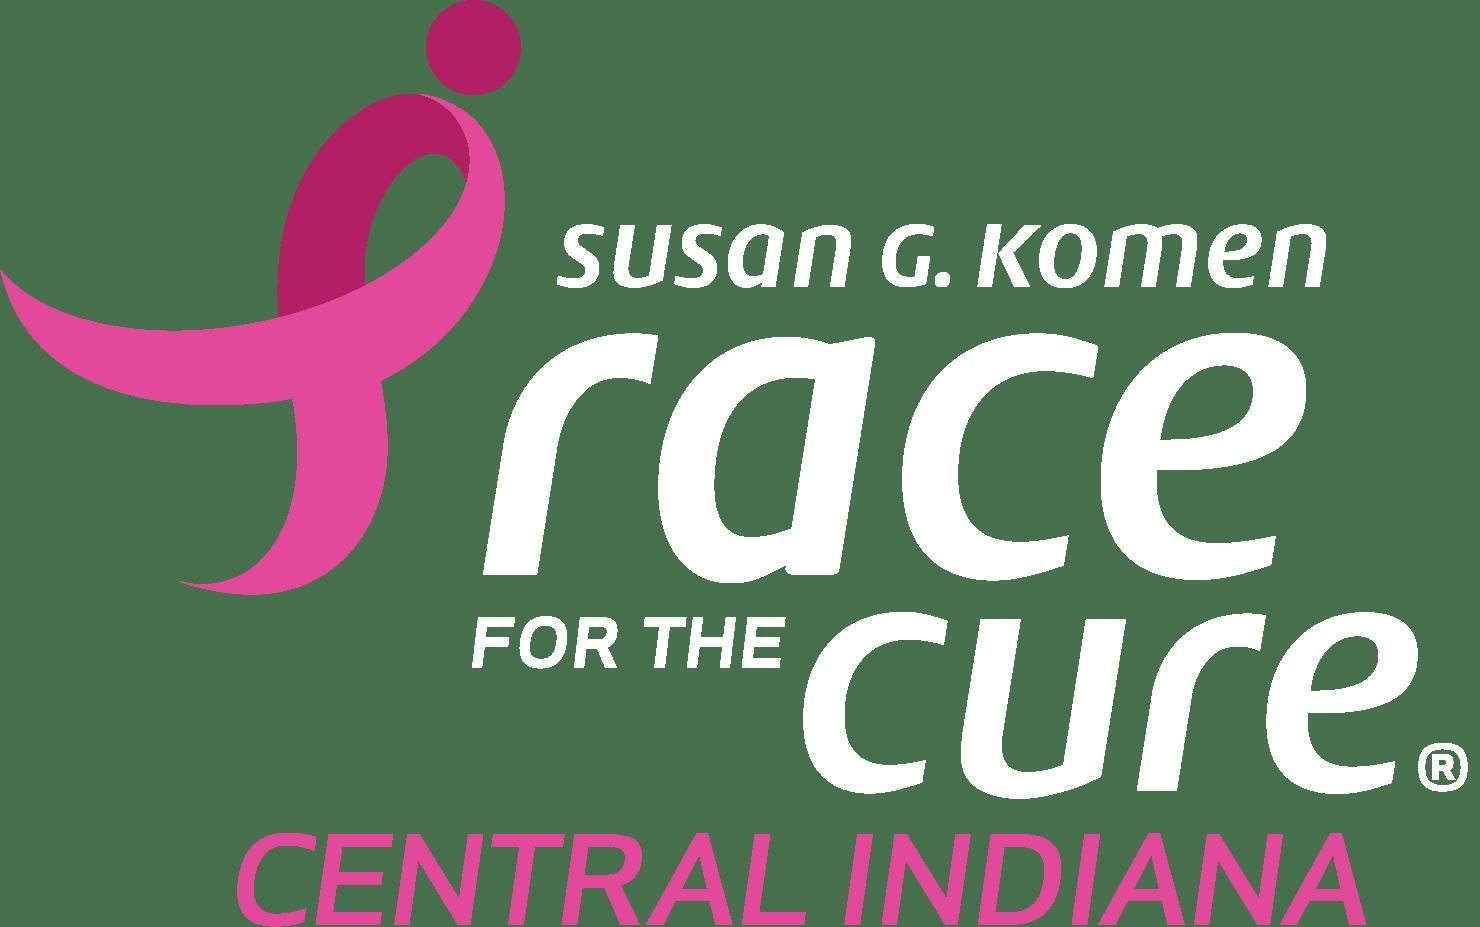 Race clipart result. Susan g komen dallas